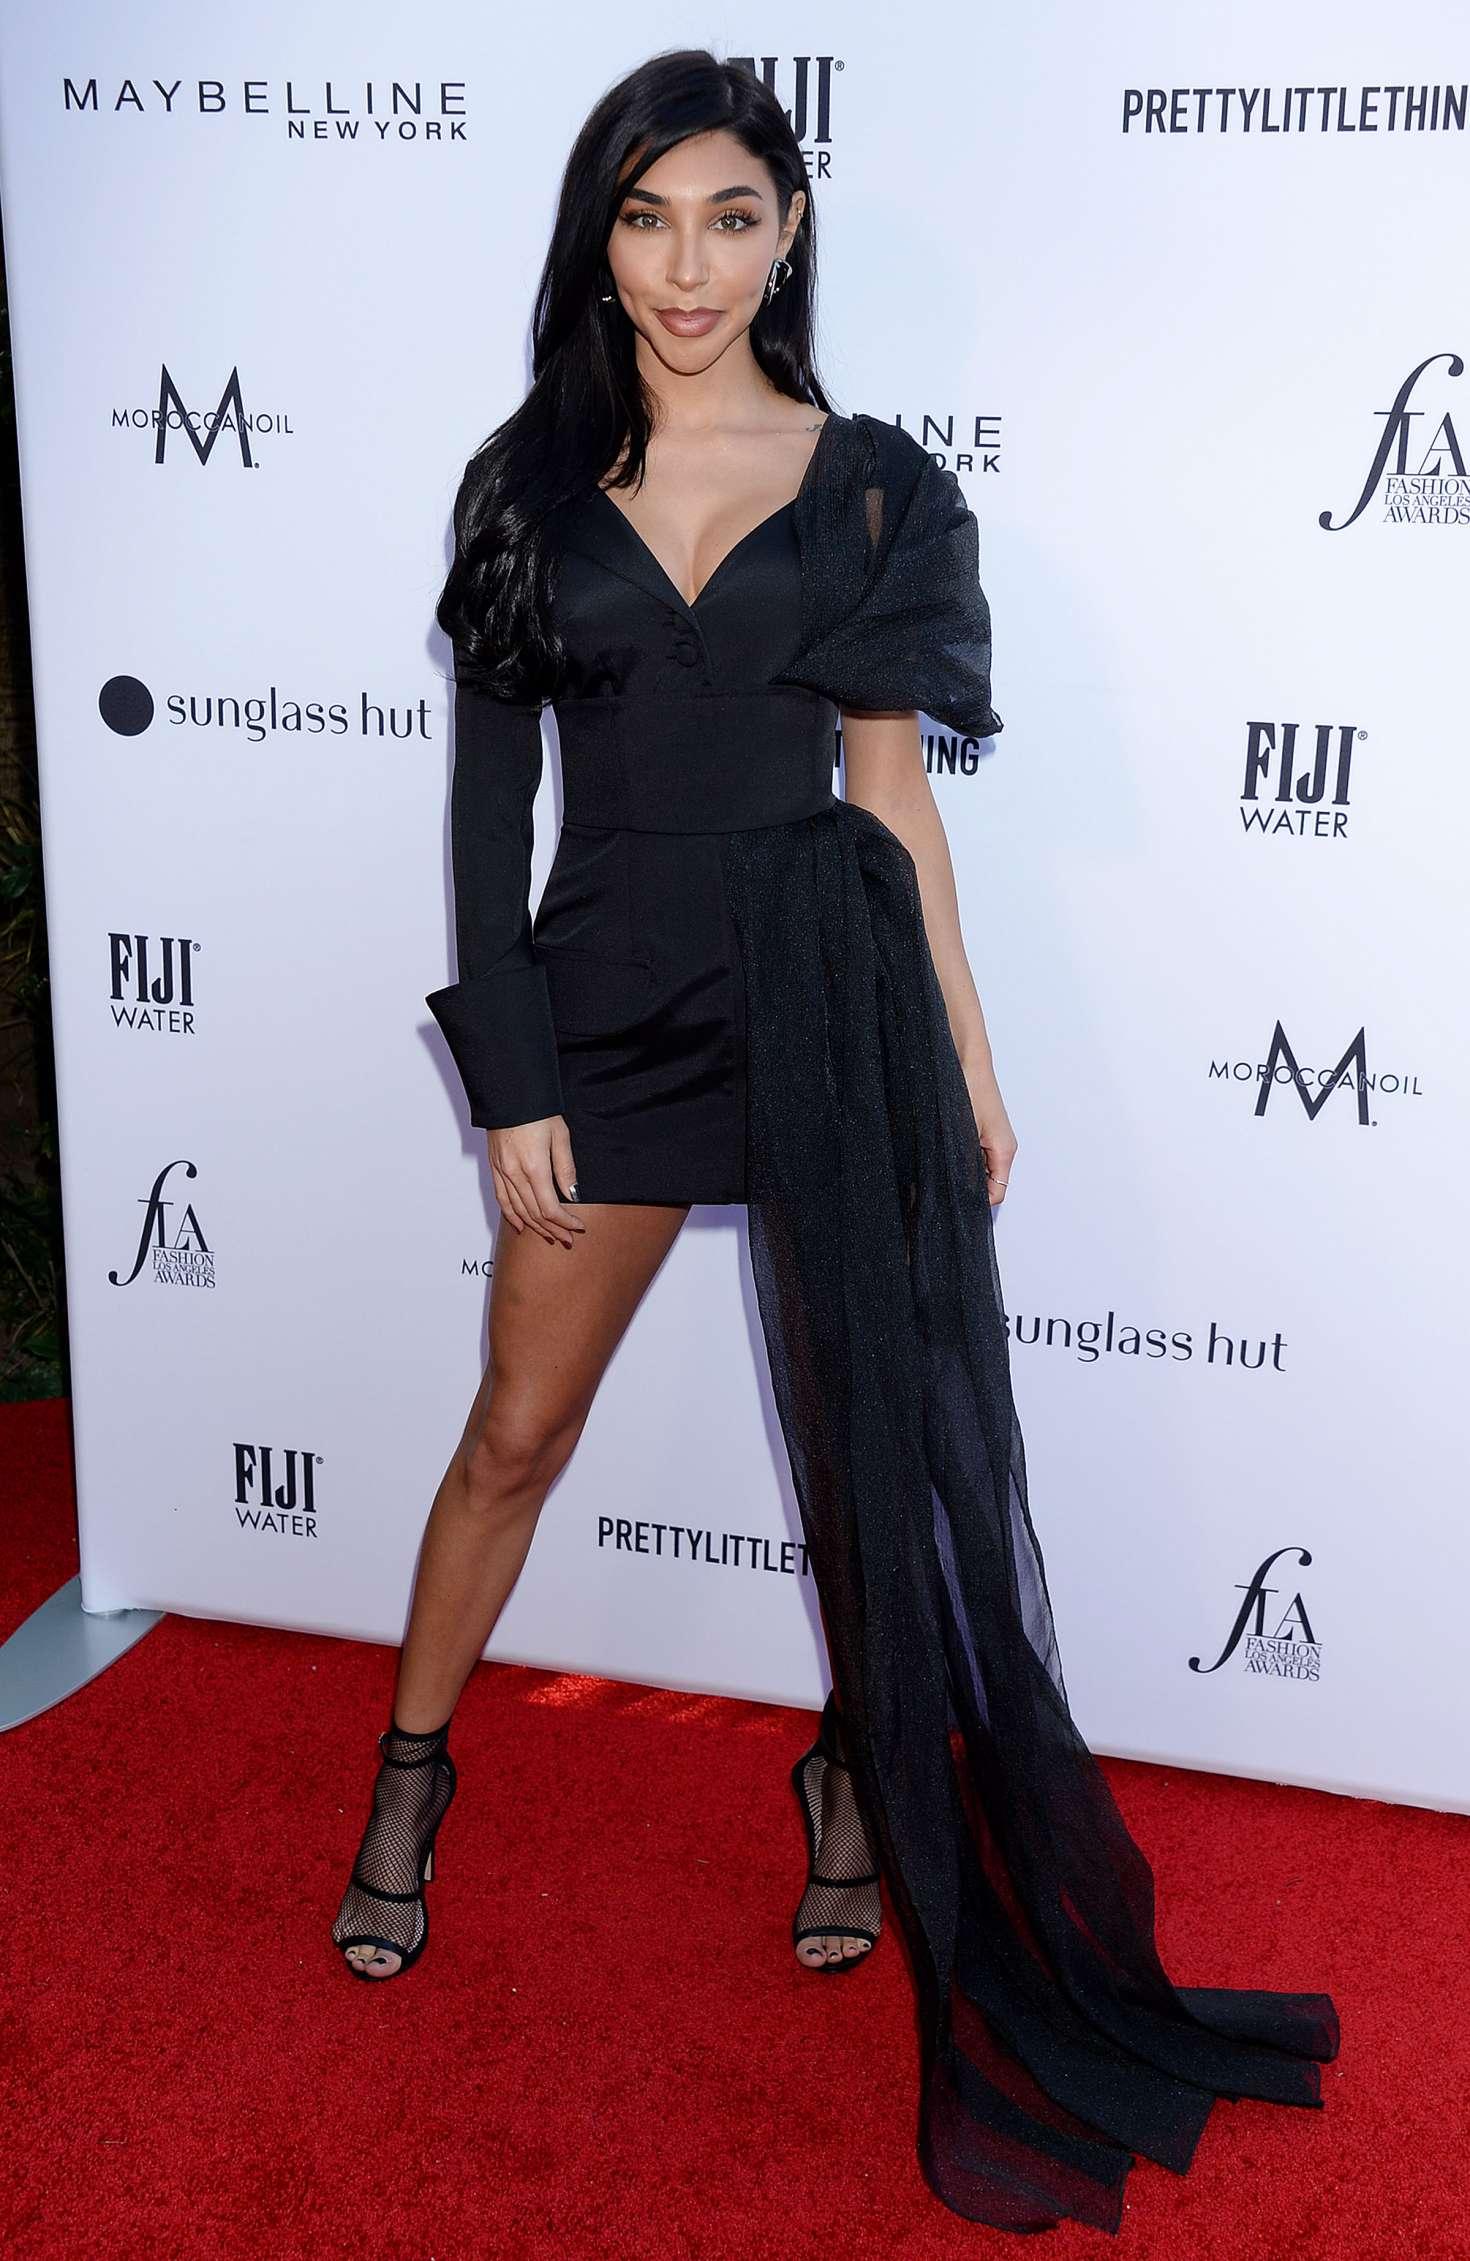 Chantel Jeffries 2019 : Chantel Jeffries: Daily Front Row Fashion Awards 2019 -05